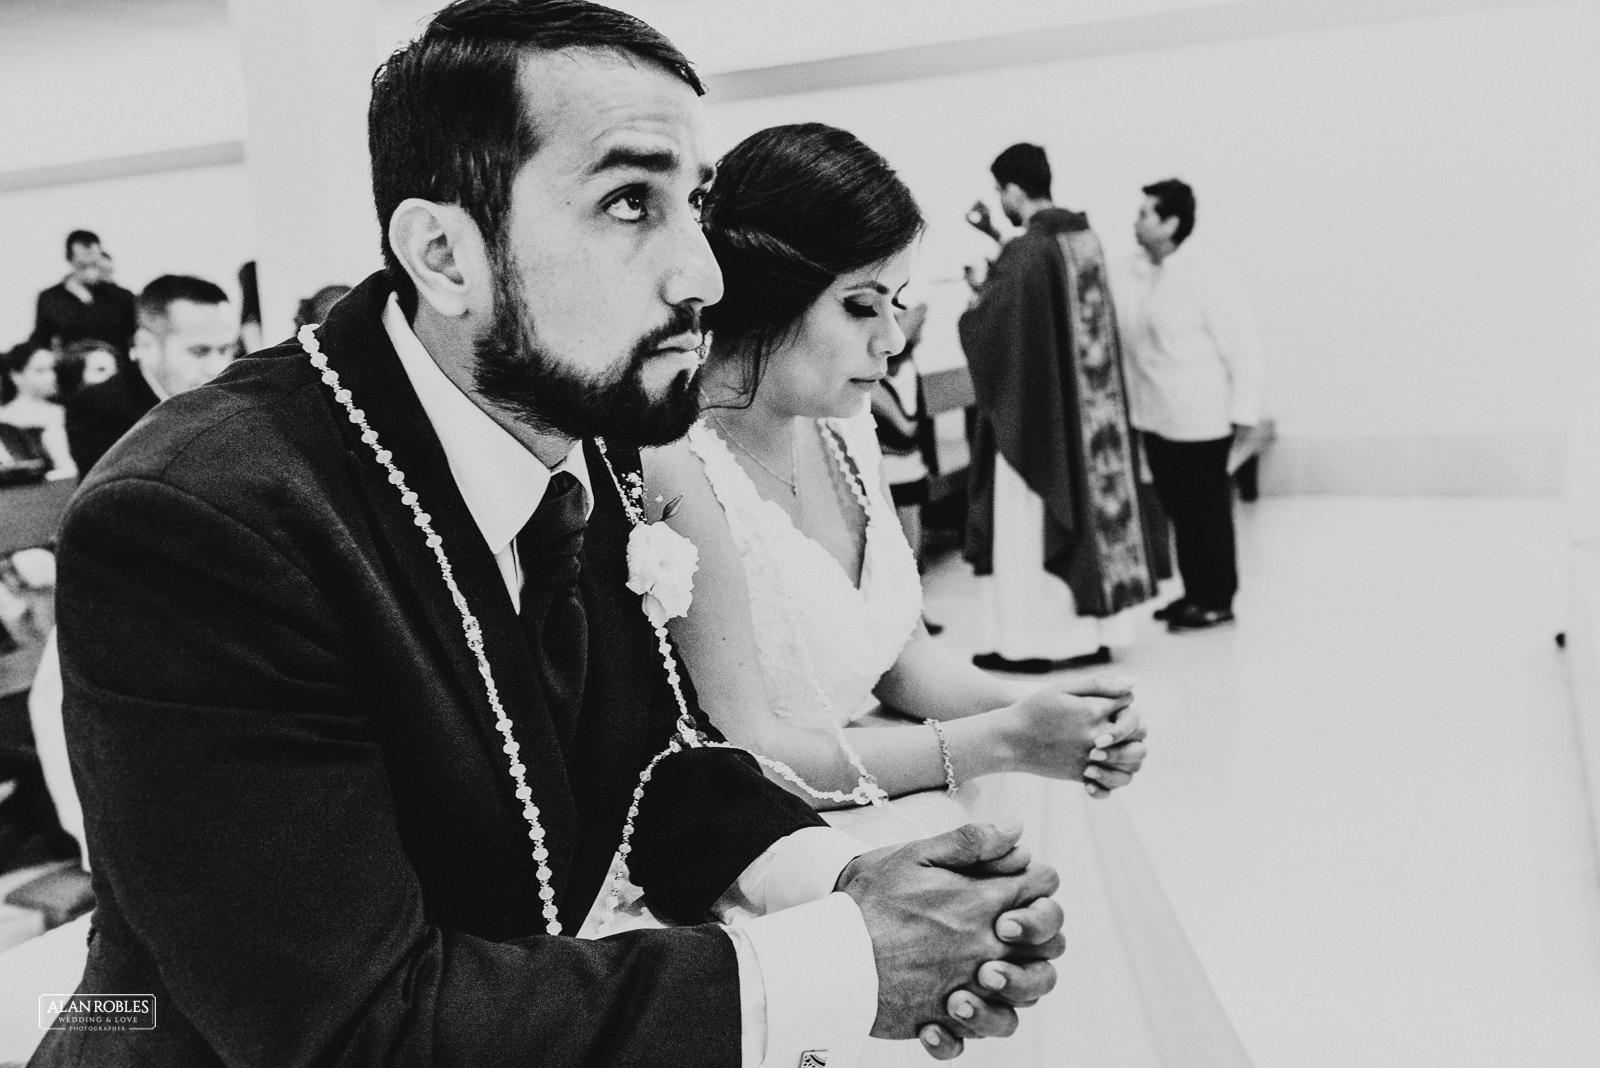 Fotografo de bodas Alan Robles-Boda en Guadalajara Real San Javier-47